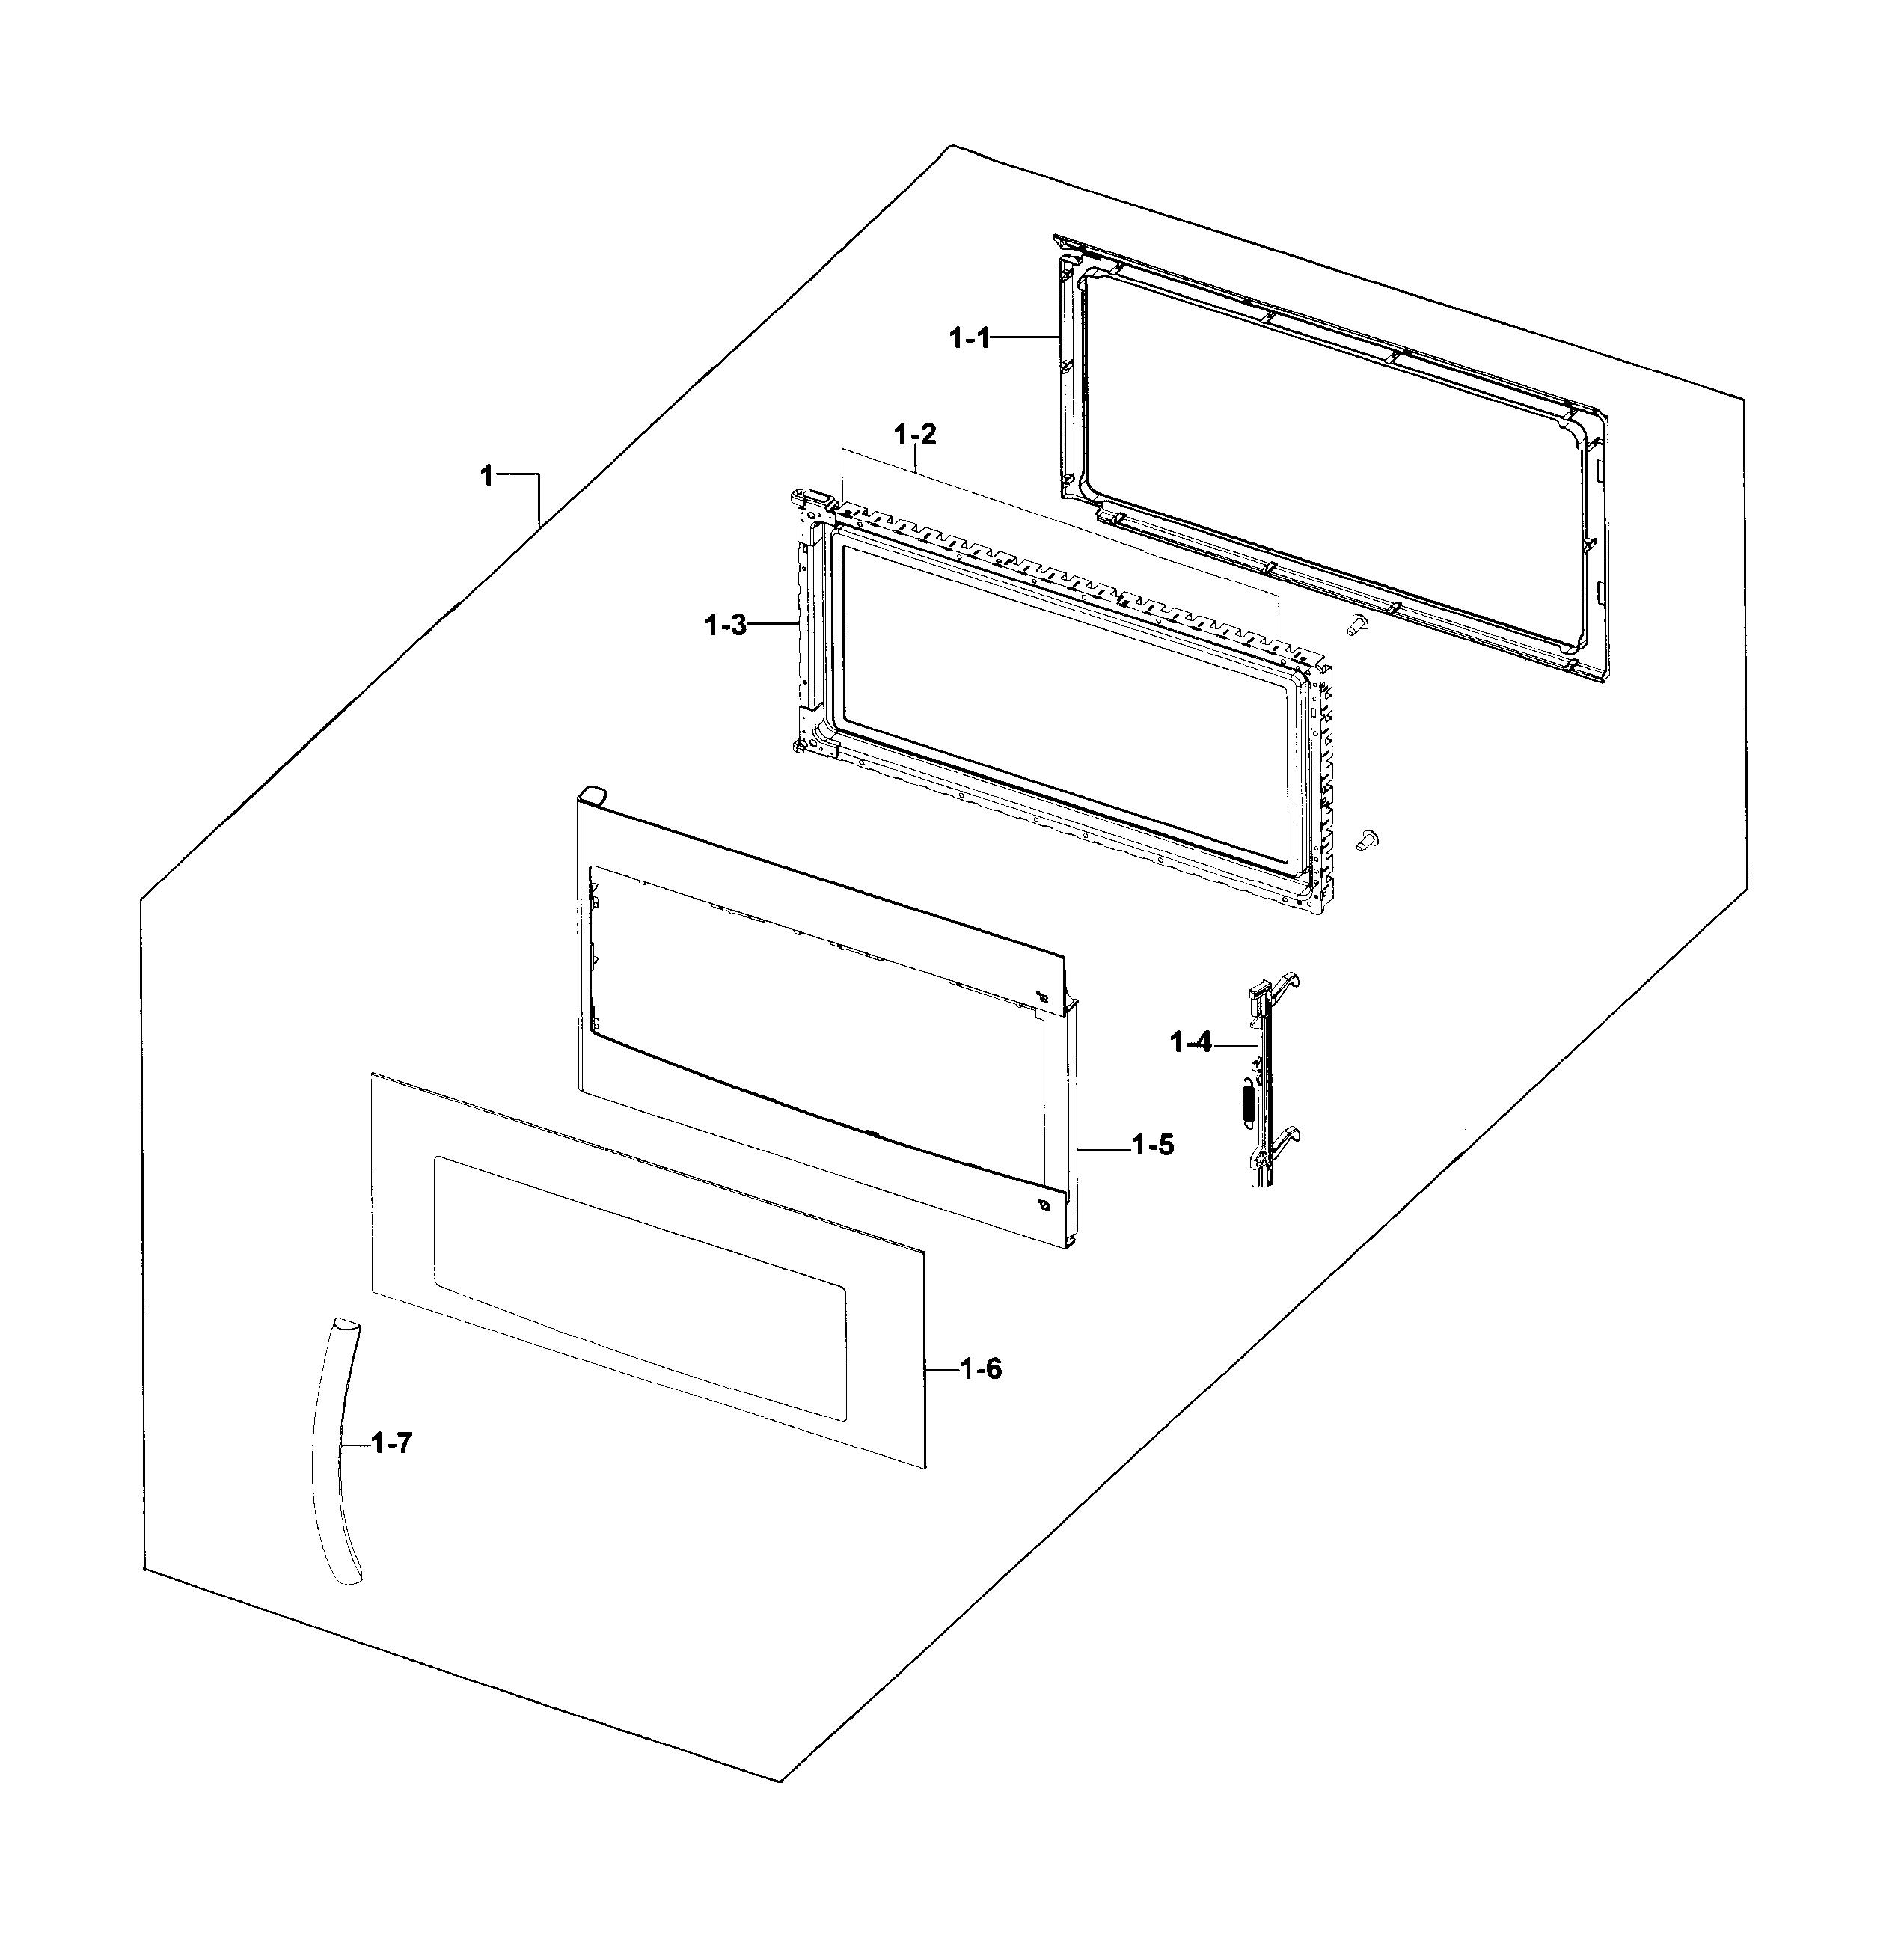 Samsung Smh9207st Microwave Wiring Diagram Parts Auto Circuit Ce959